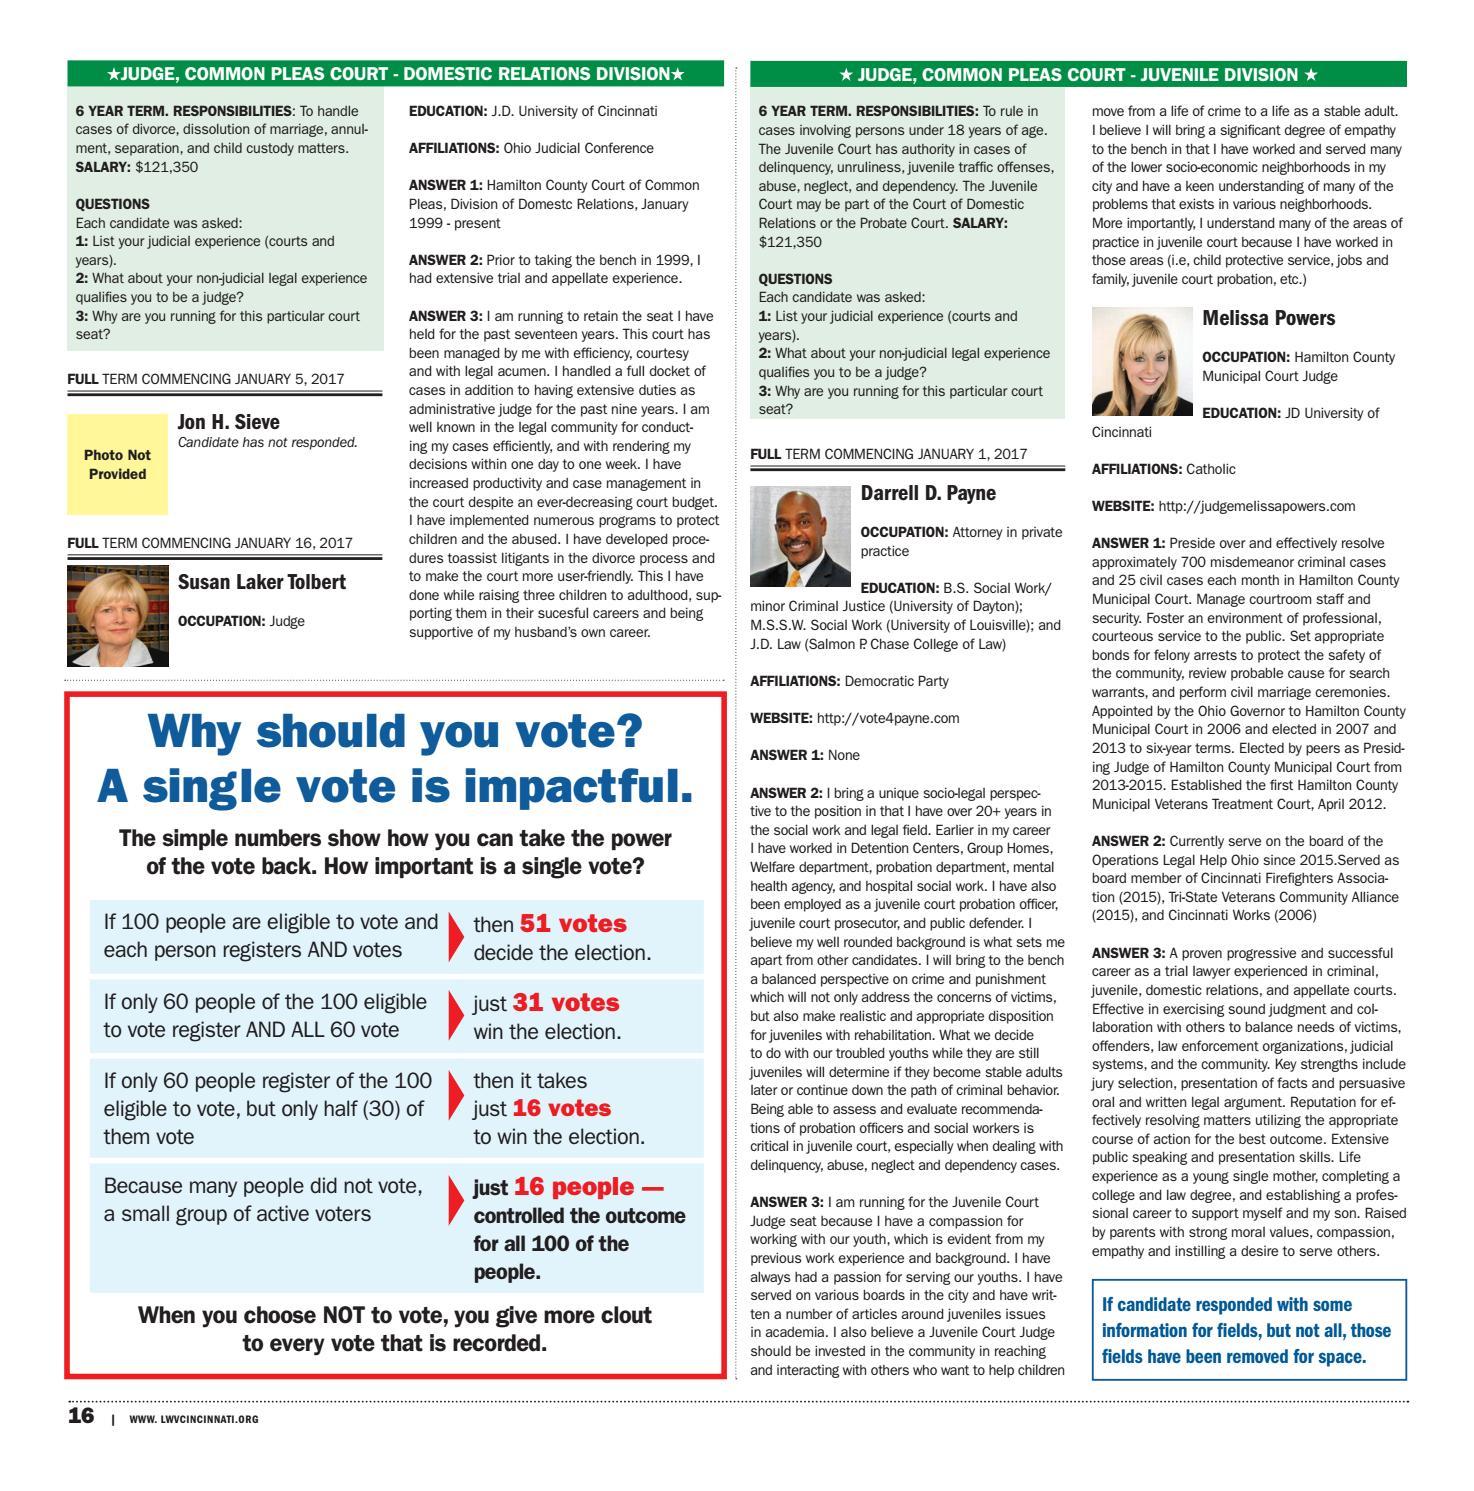 League of Women Voters 2016 Election Guide by Cincinnati CityBeat